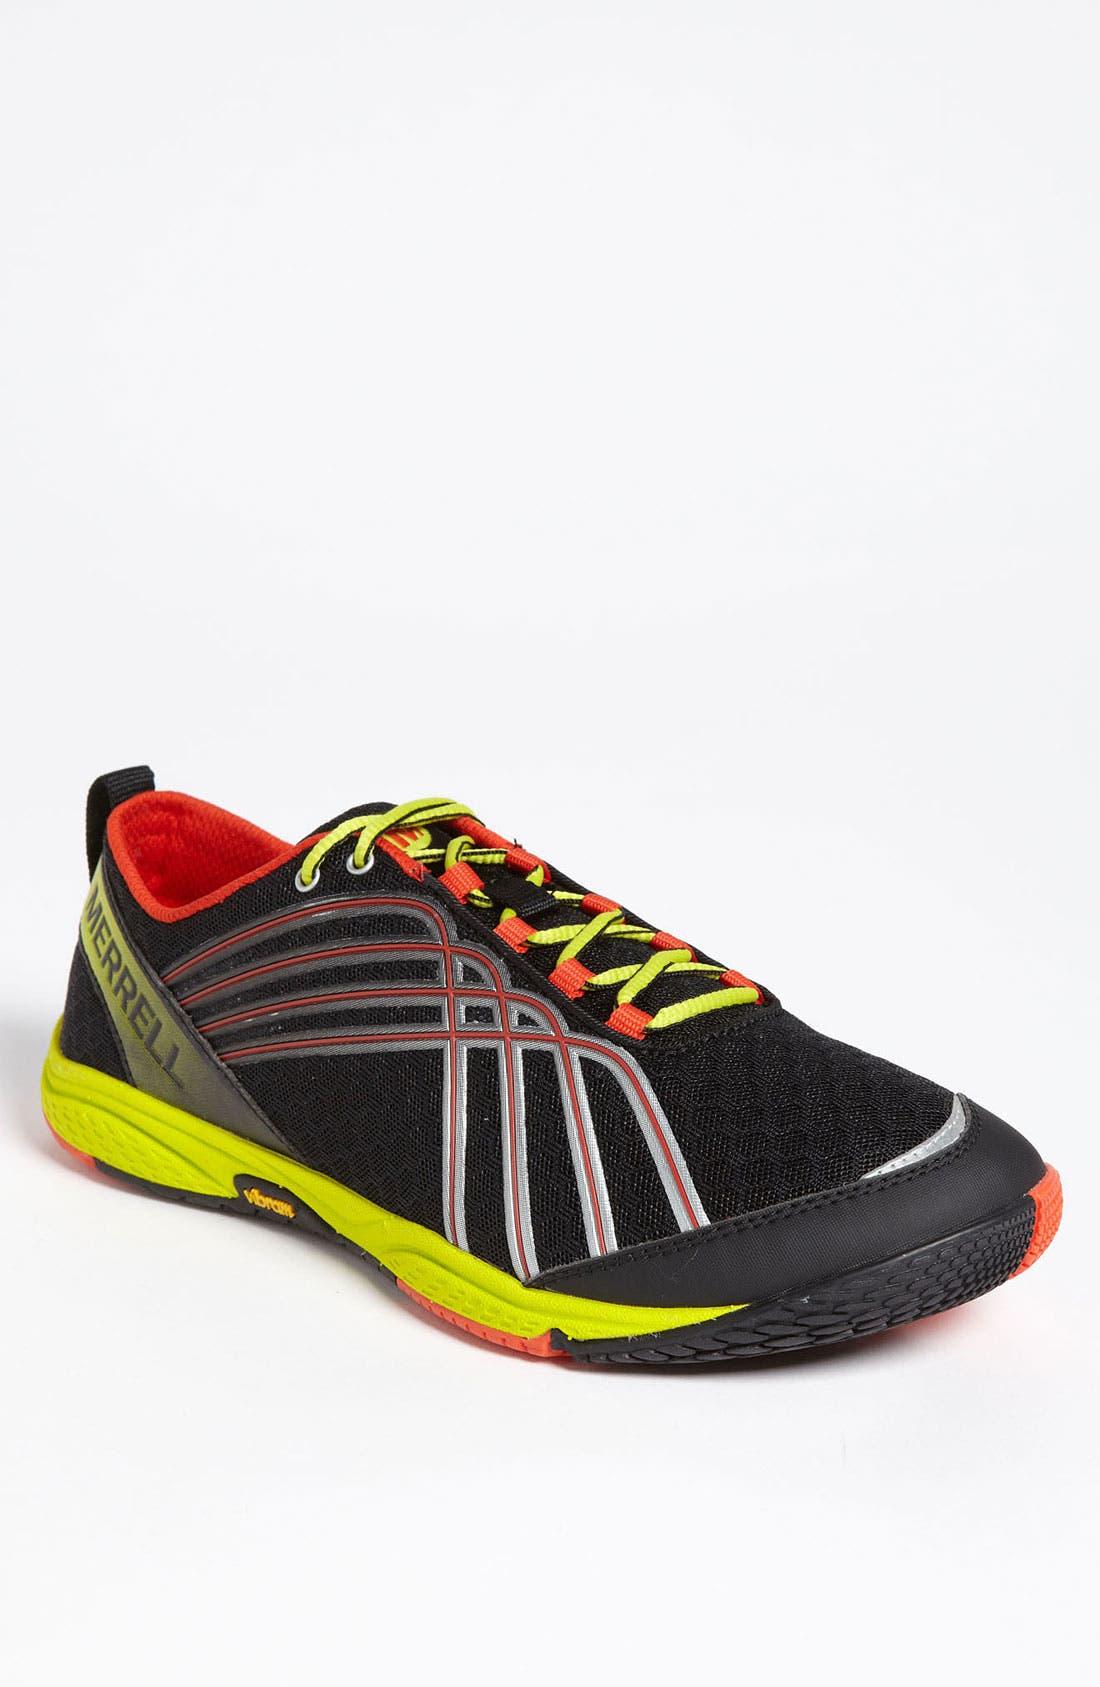 Main Image - Merrell 'Road Glove 2' Running Shoe (Men)